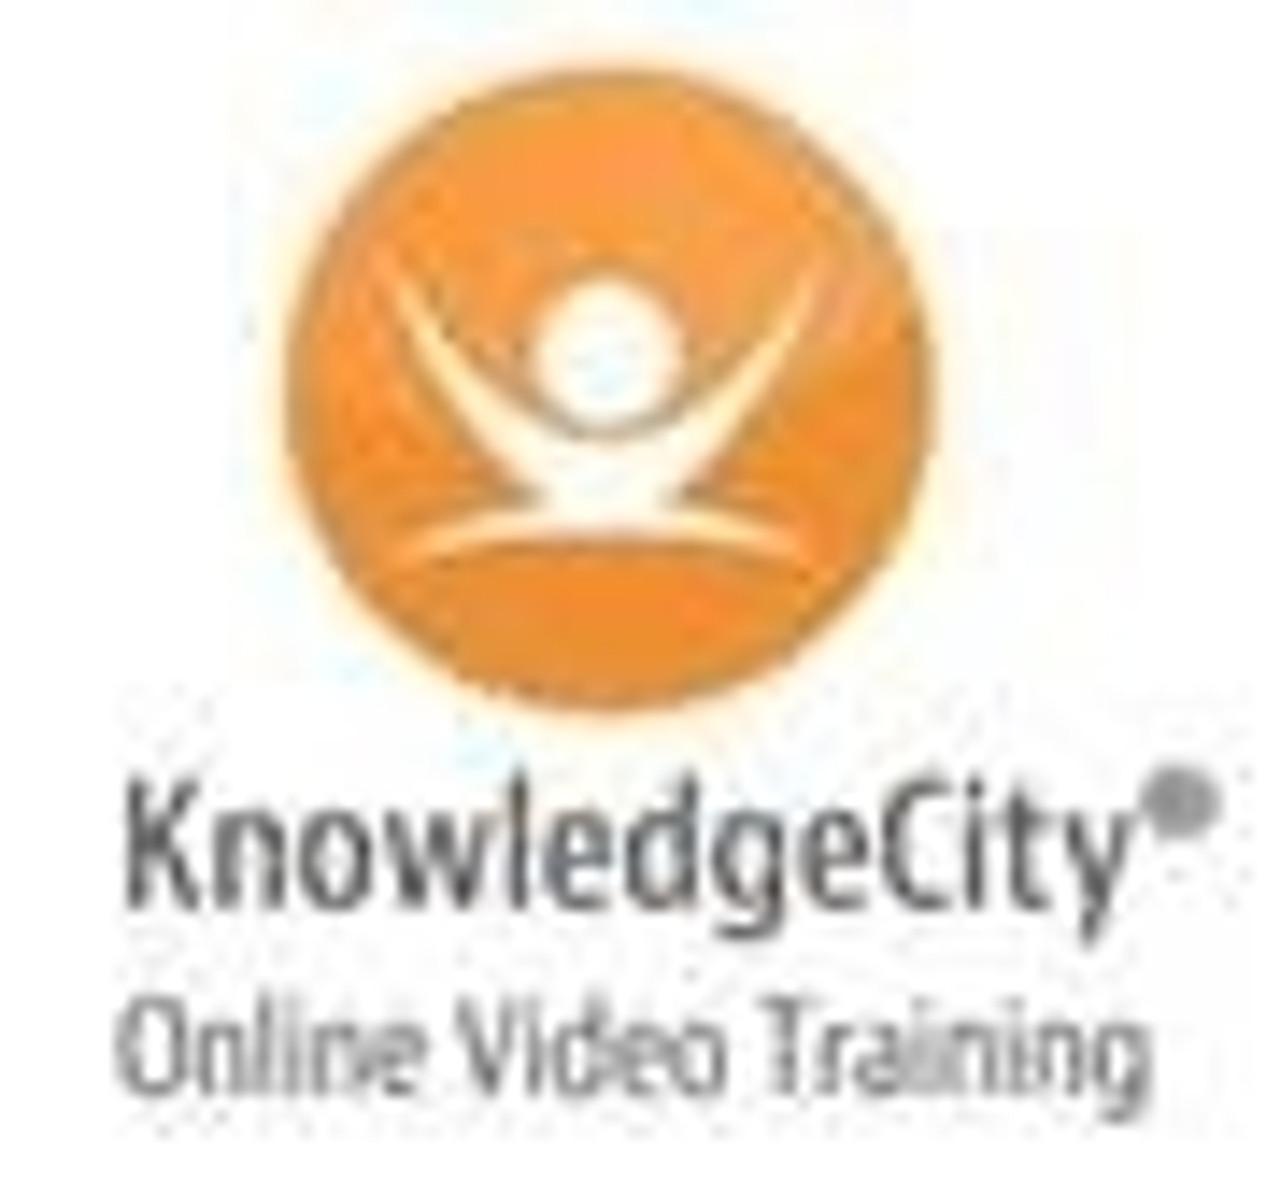 KnowledgeCity Online Video Training logo